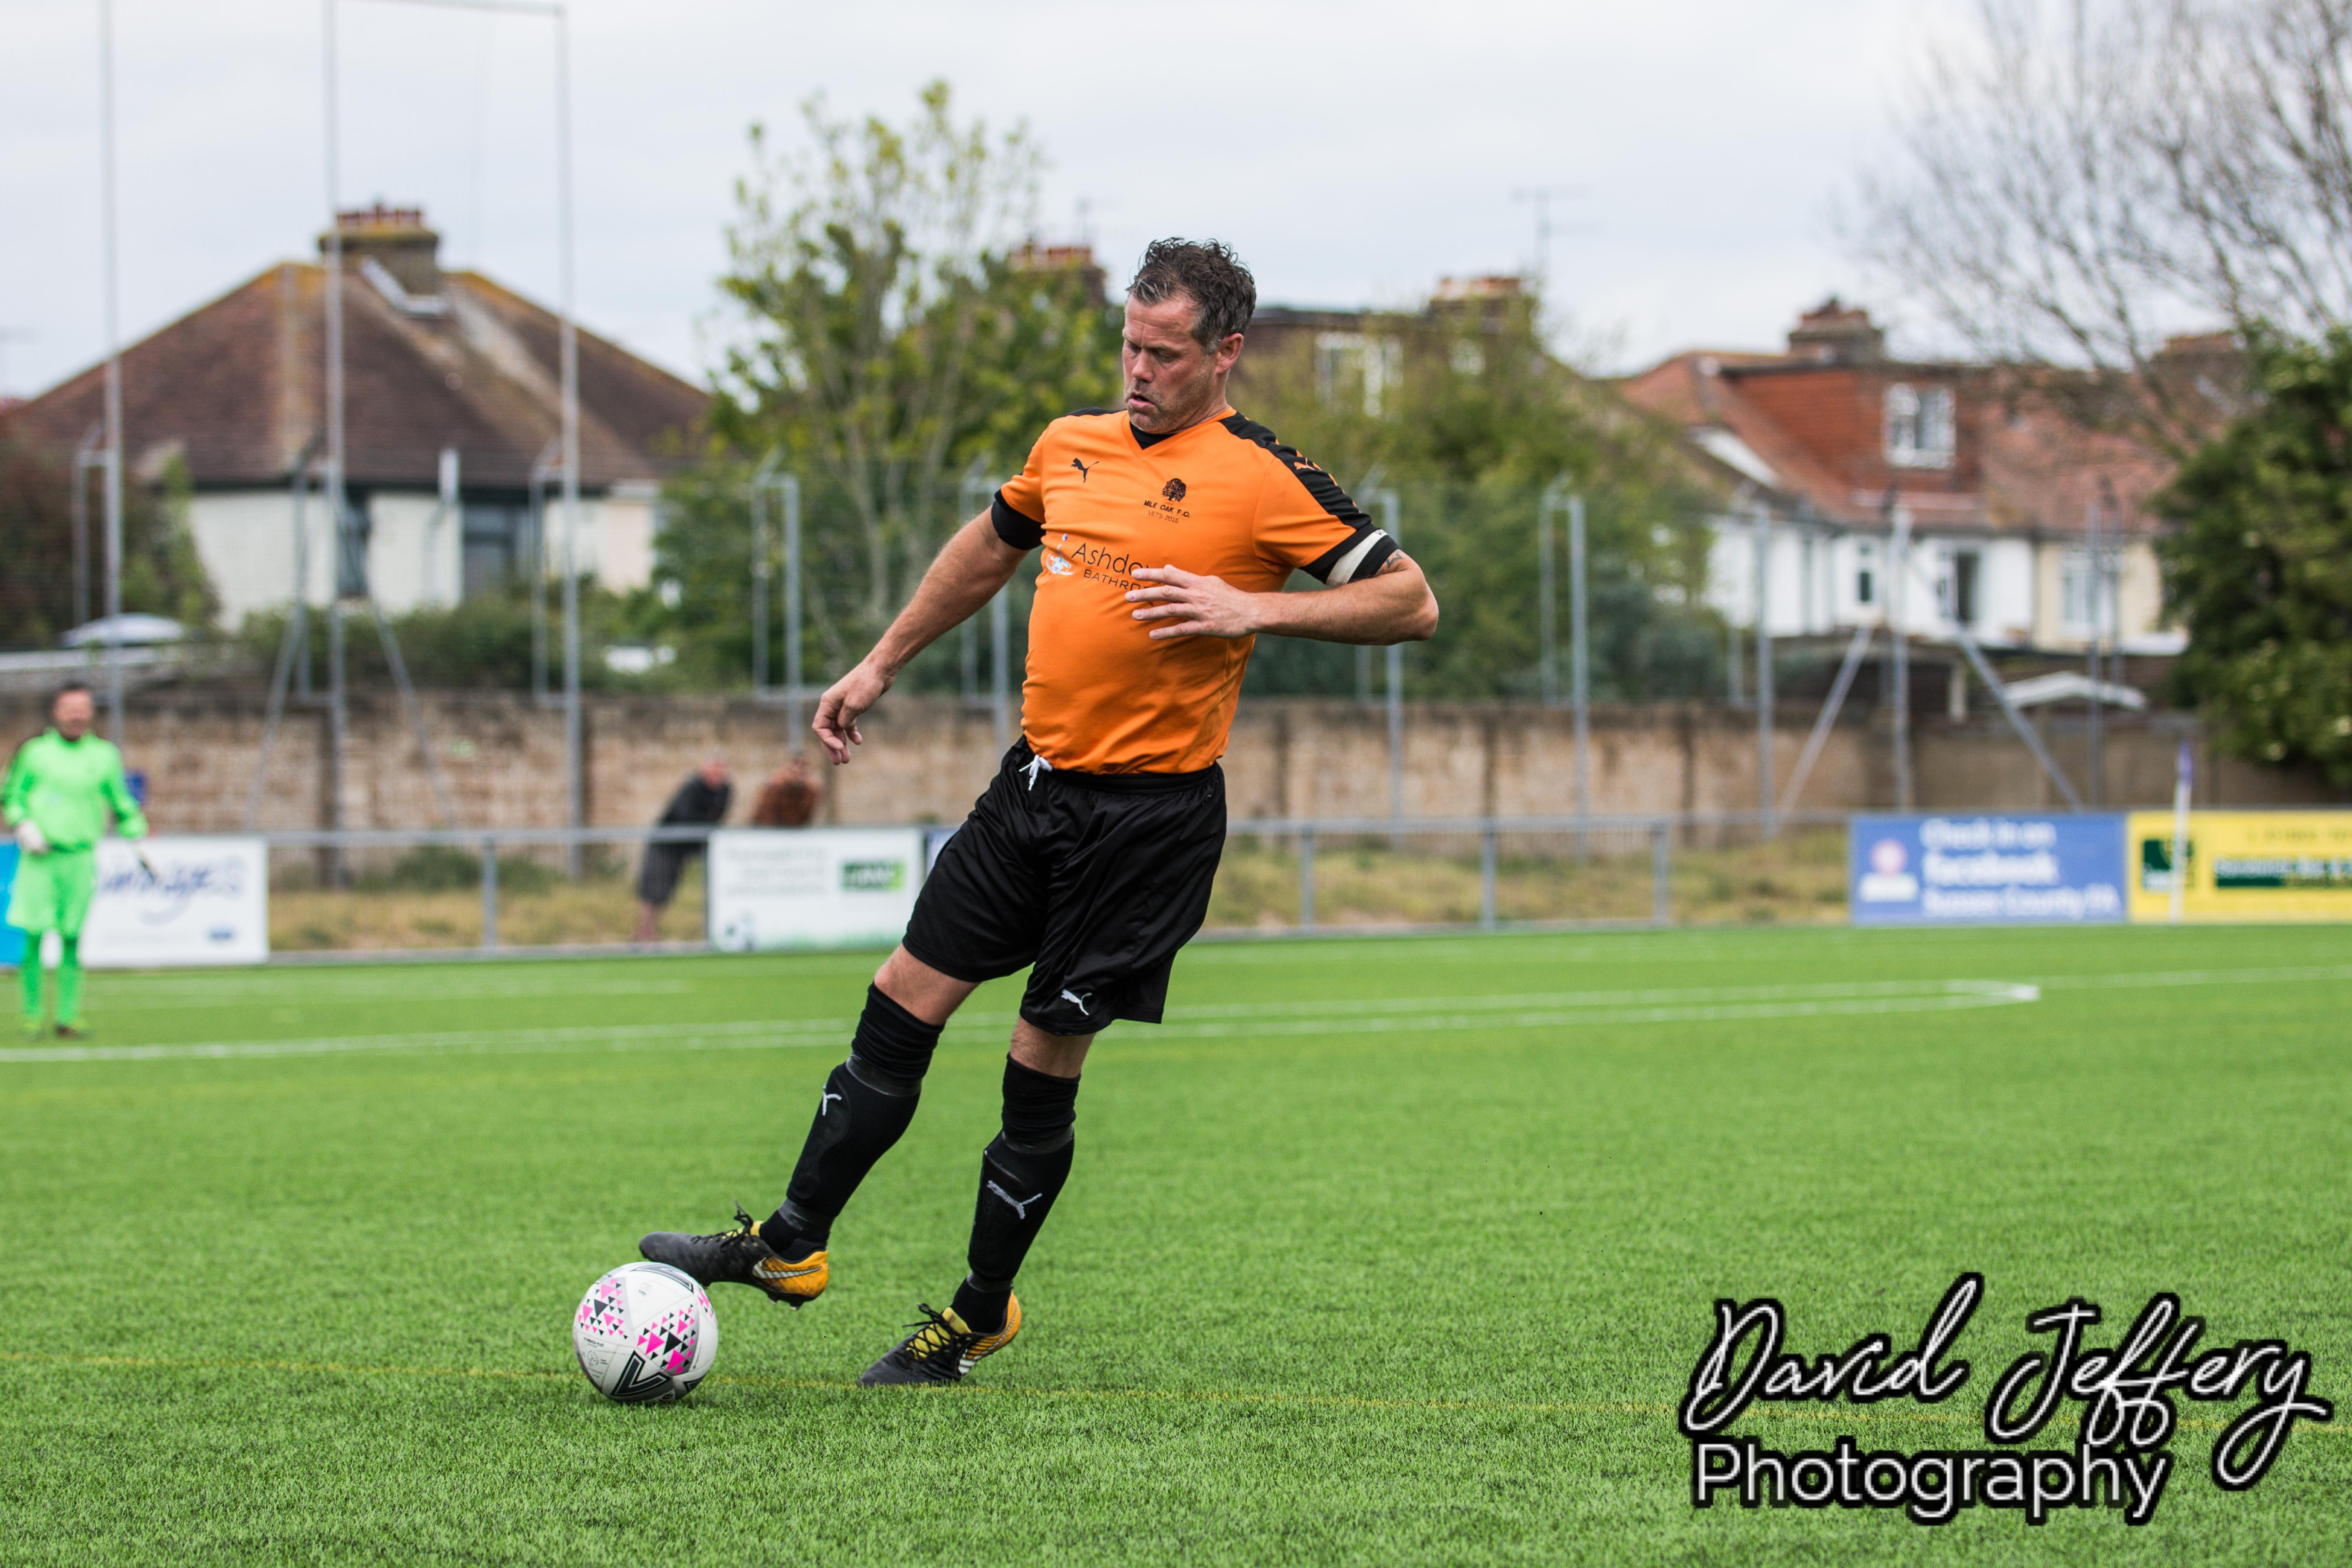 070 MOFC Vets vs Horl Vets 05.05